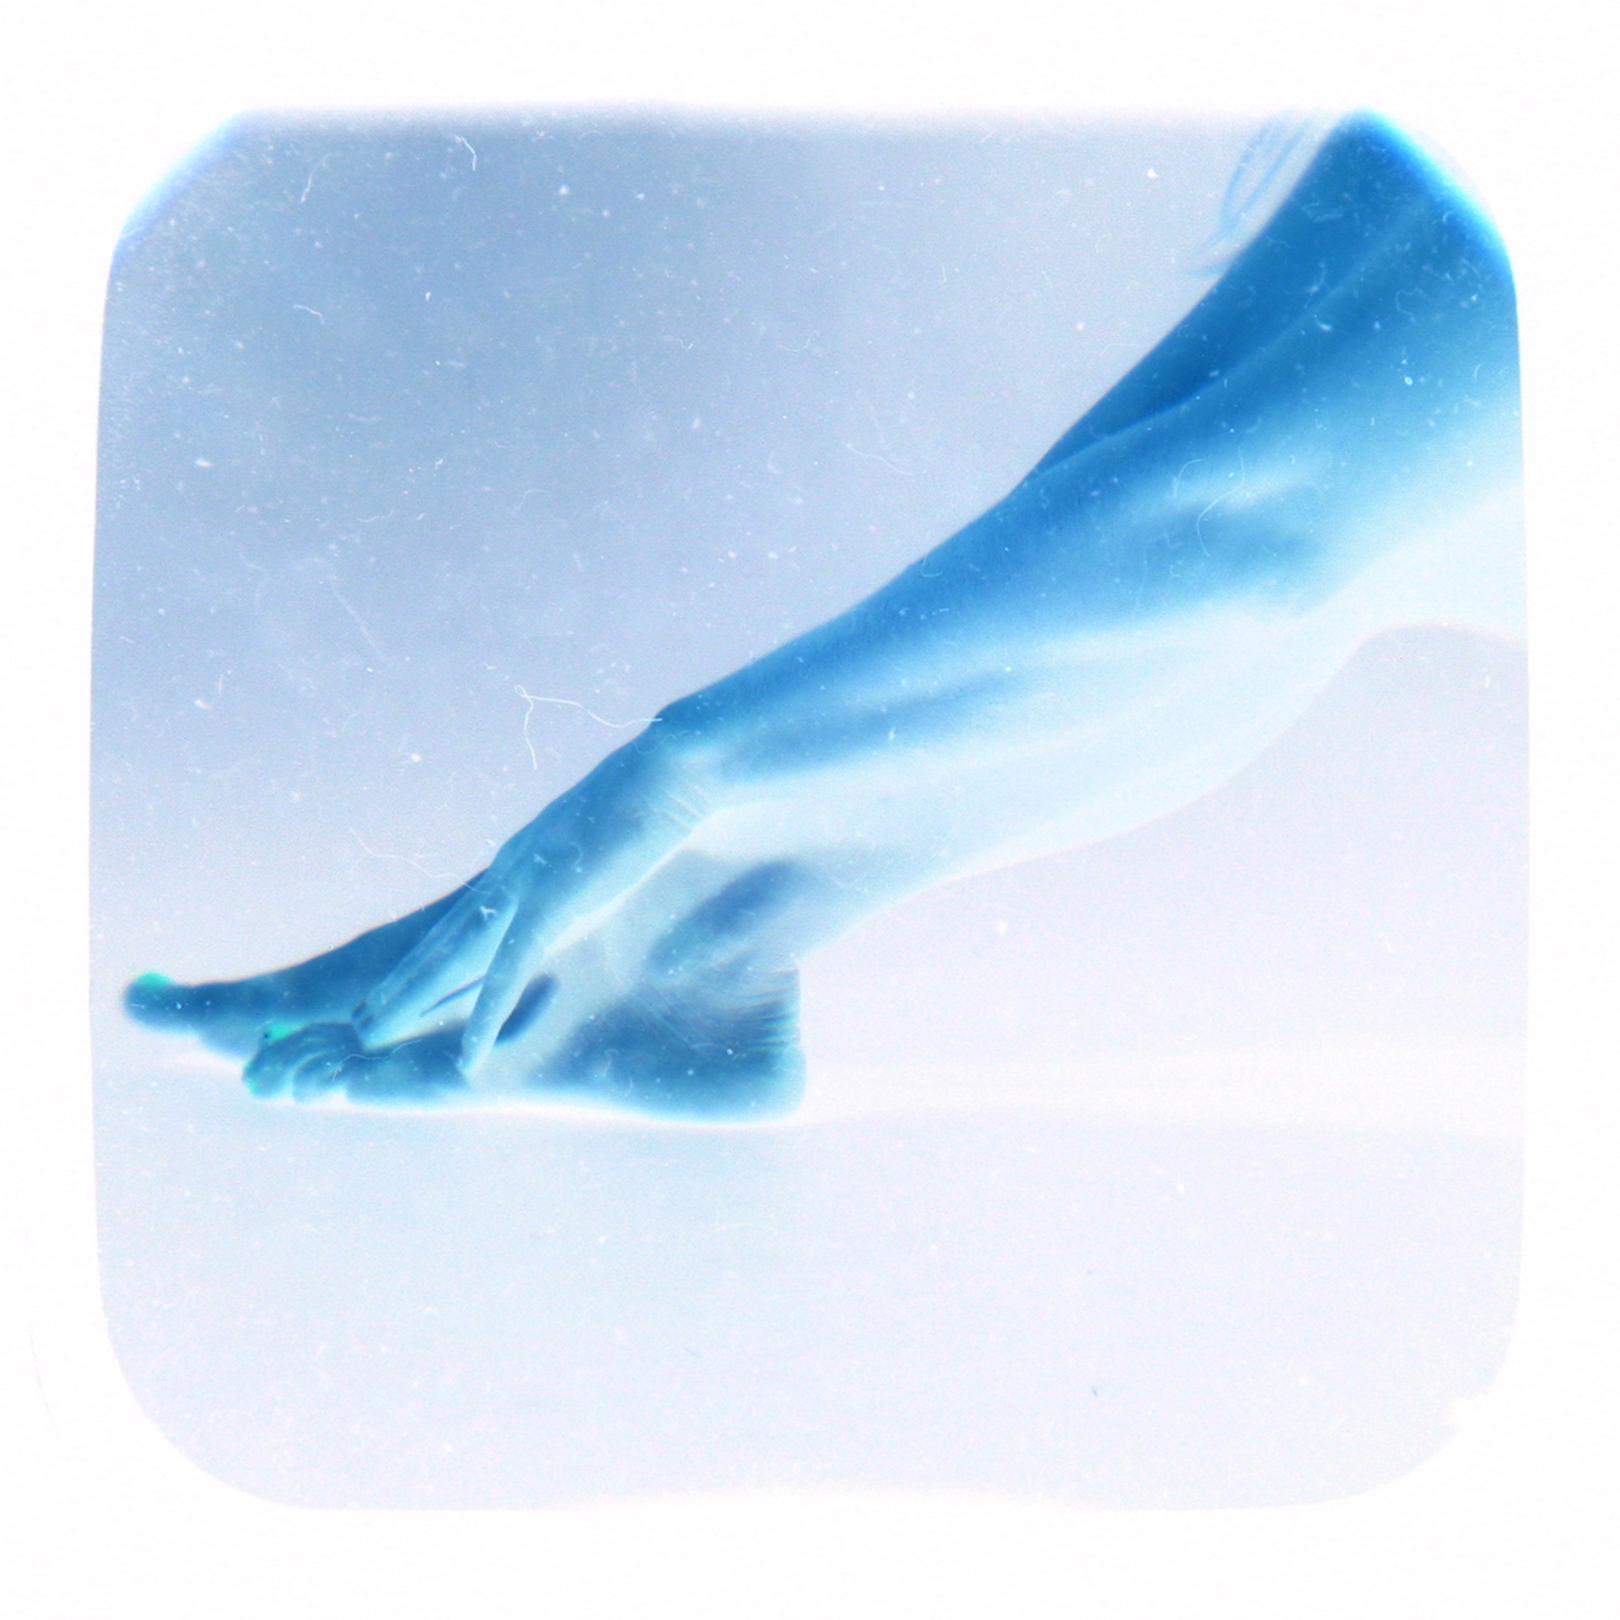 BLUE PRINT 5.jpg